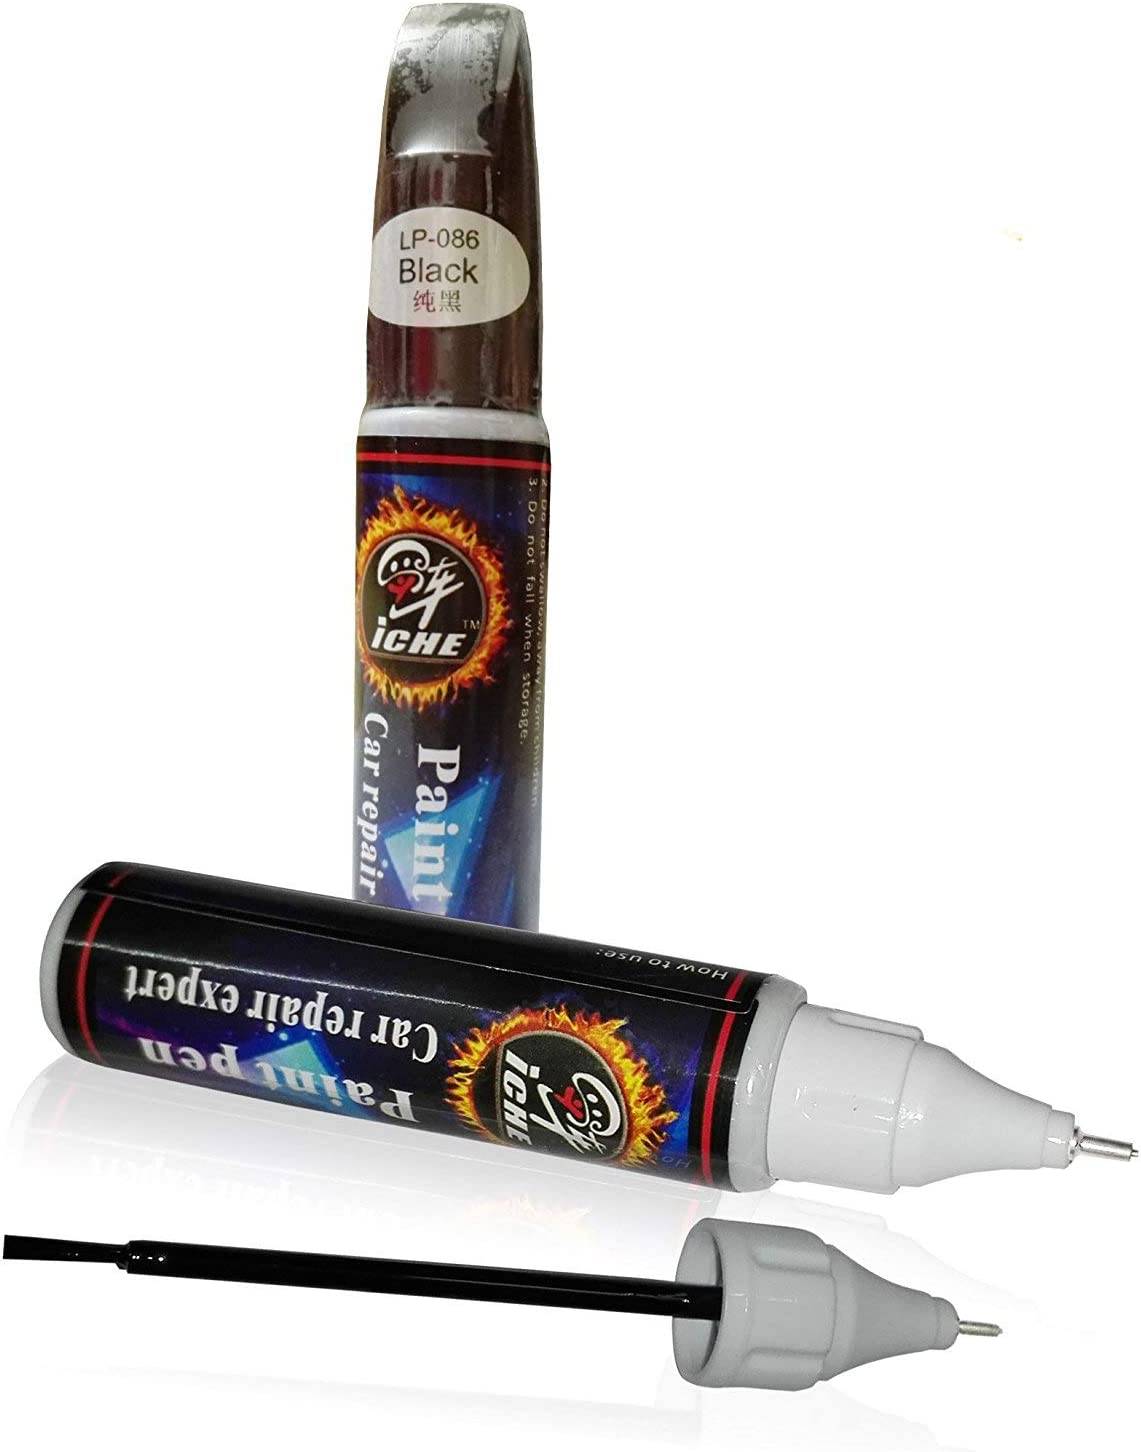 ICHE Car Scratch Repair Remover Sealer Painting Pen Filler New sales Surprise price